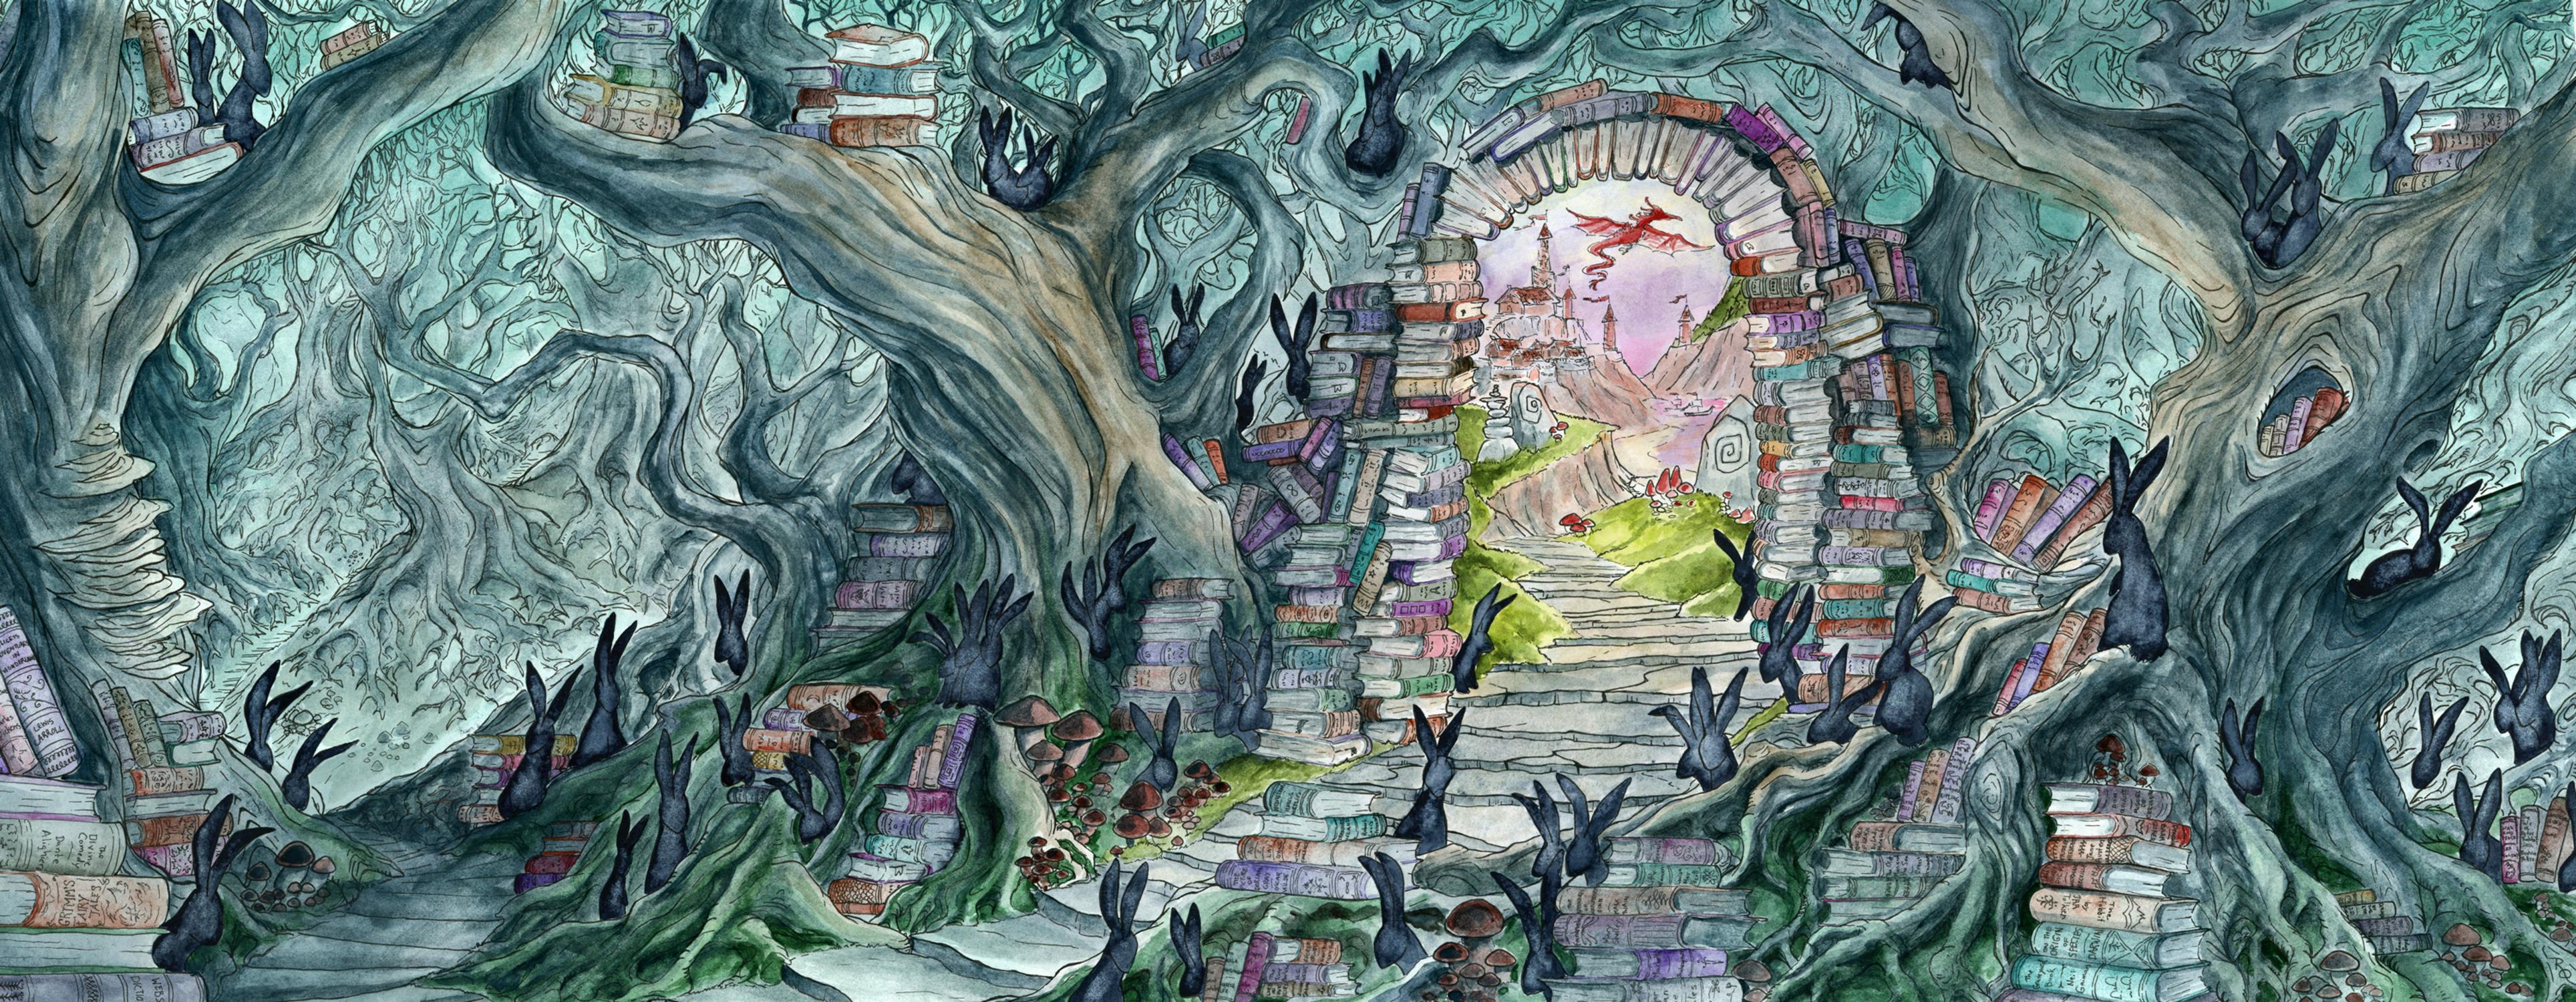 Portal Artwork by Rachel Quinlan